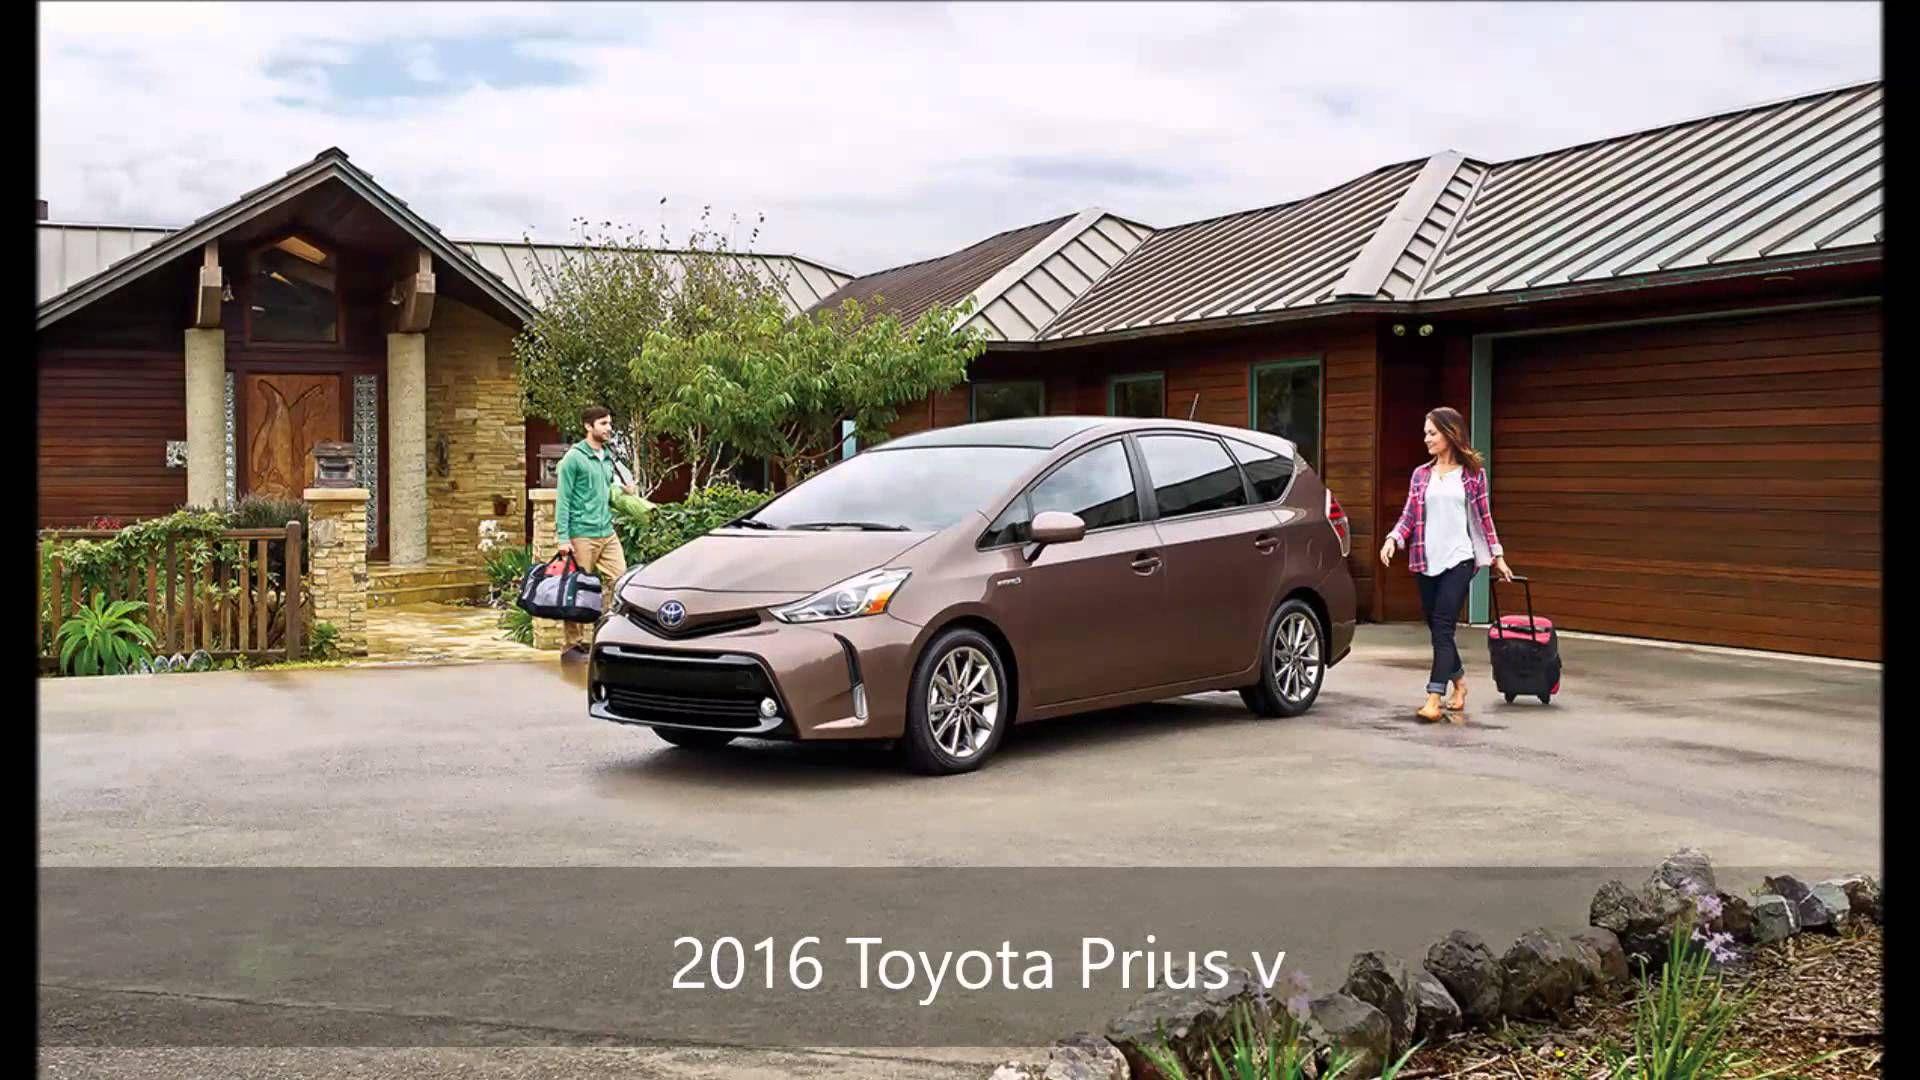 2016 Toyota Prius V From North Georgia Toyota Serving Dalton Ga And Chattanooga Tn Toyota Prius Prius Toyota Prius 2015